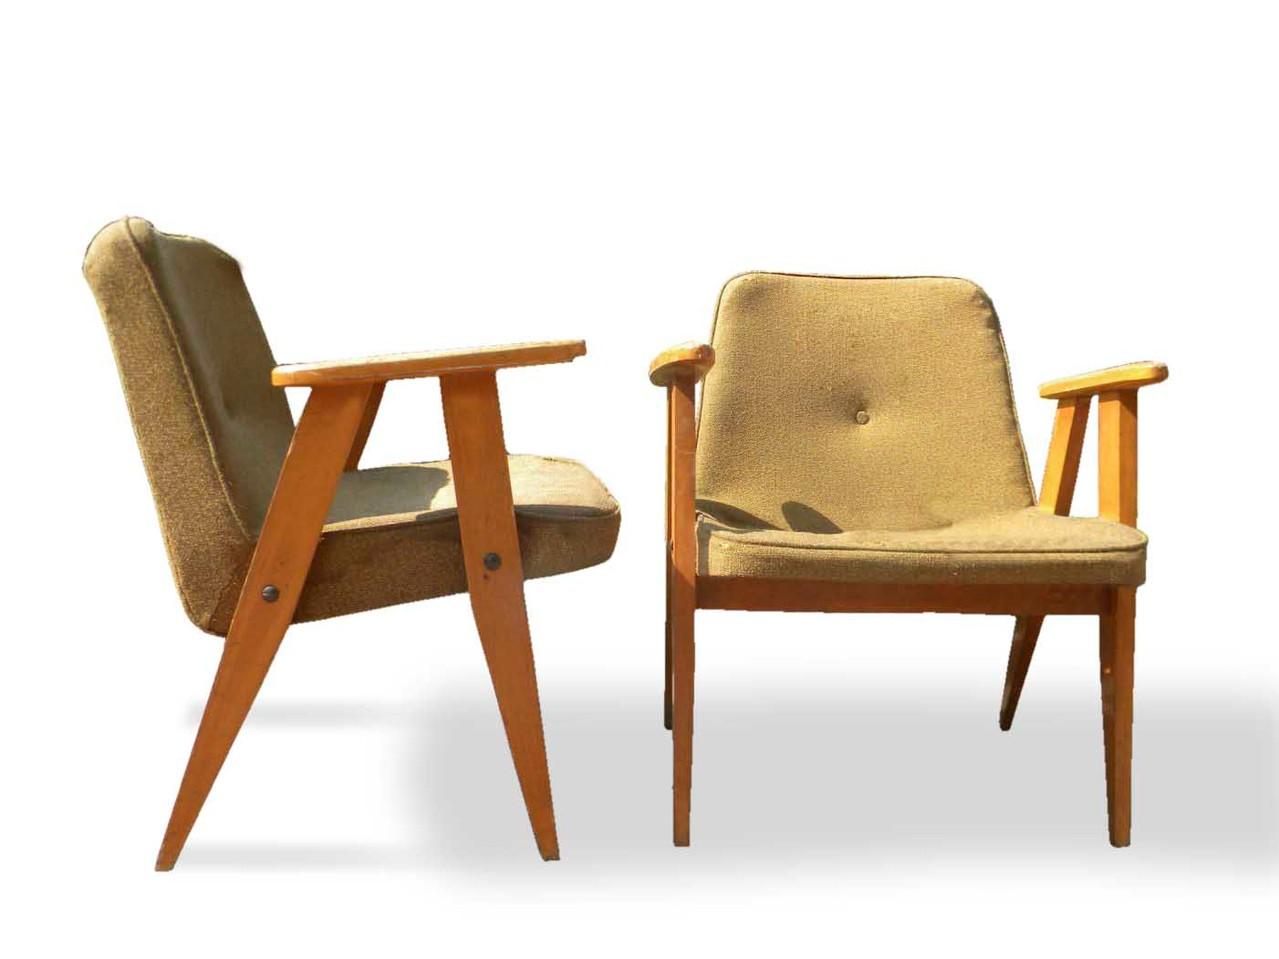 poltrone vintage marroncino italian vintage sofa. Poltrona Anni 60 Gamba Compasso In Legno Italian Vintage Sofa